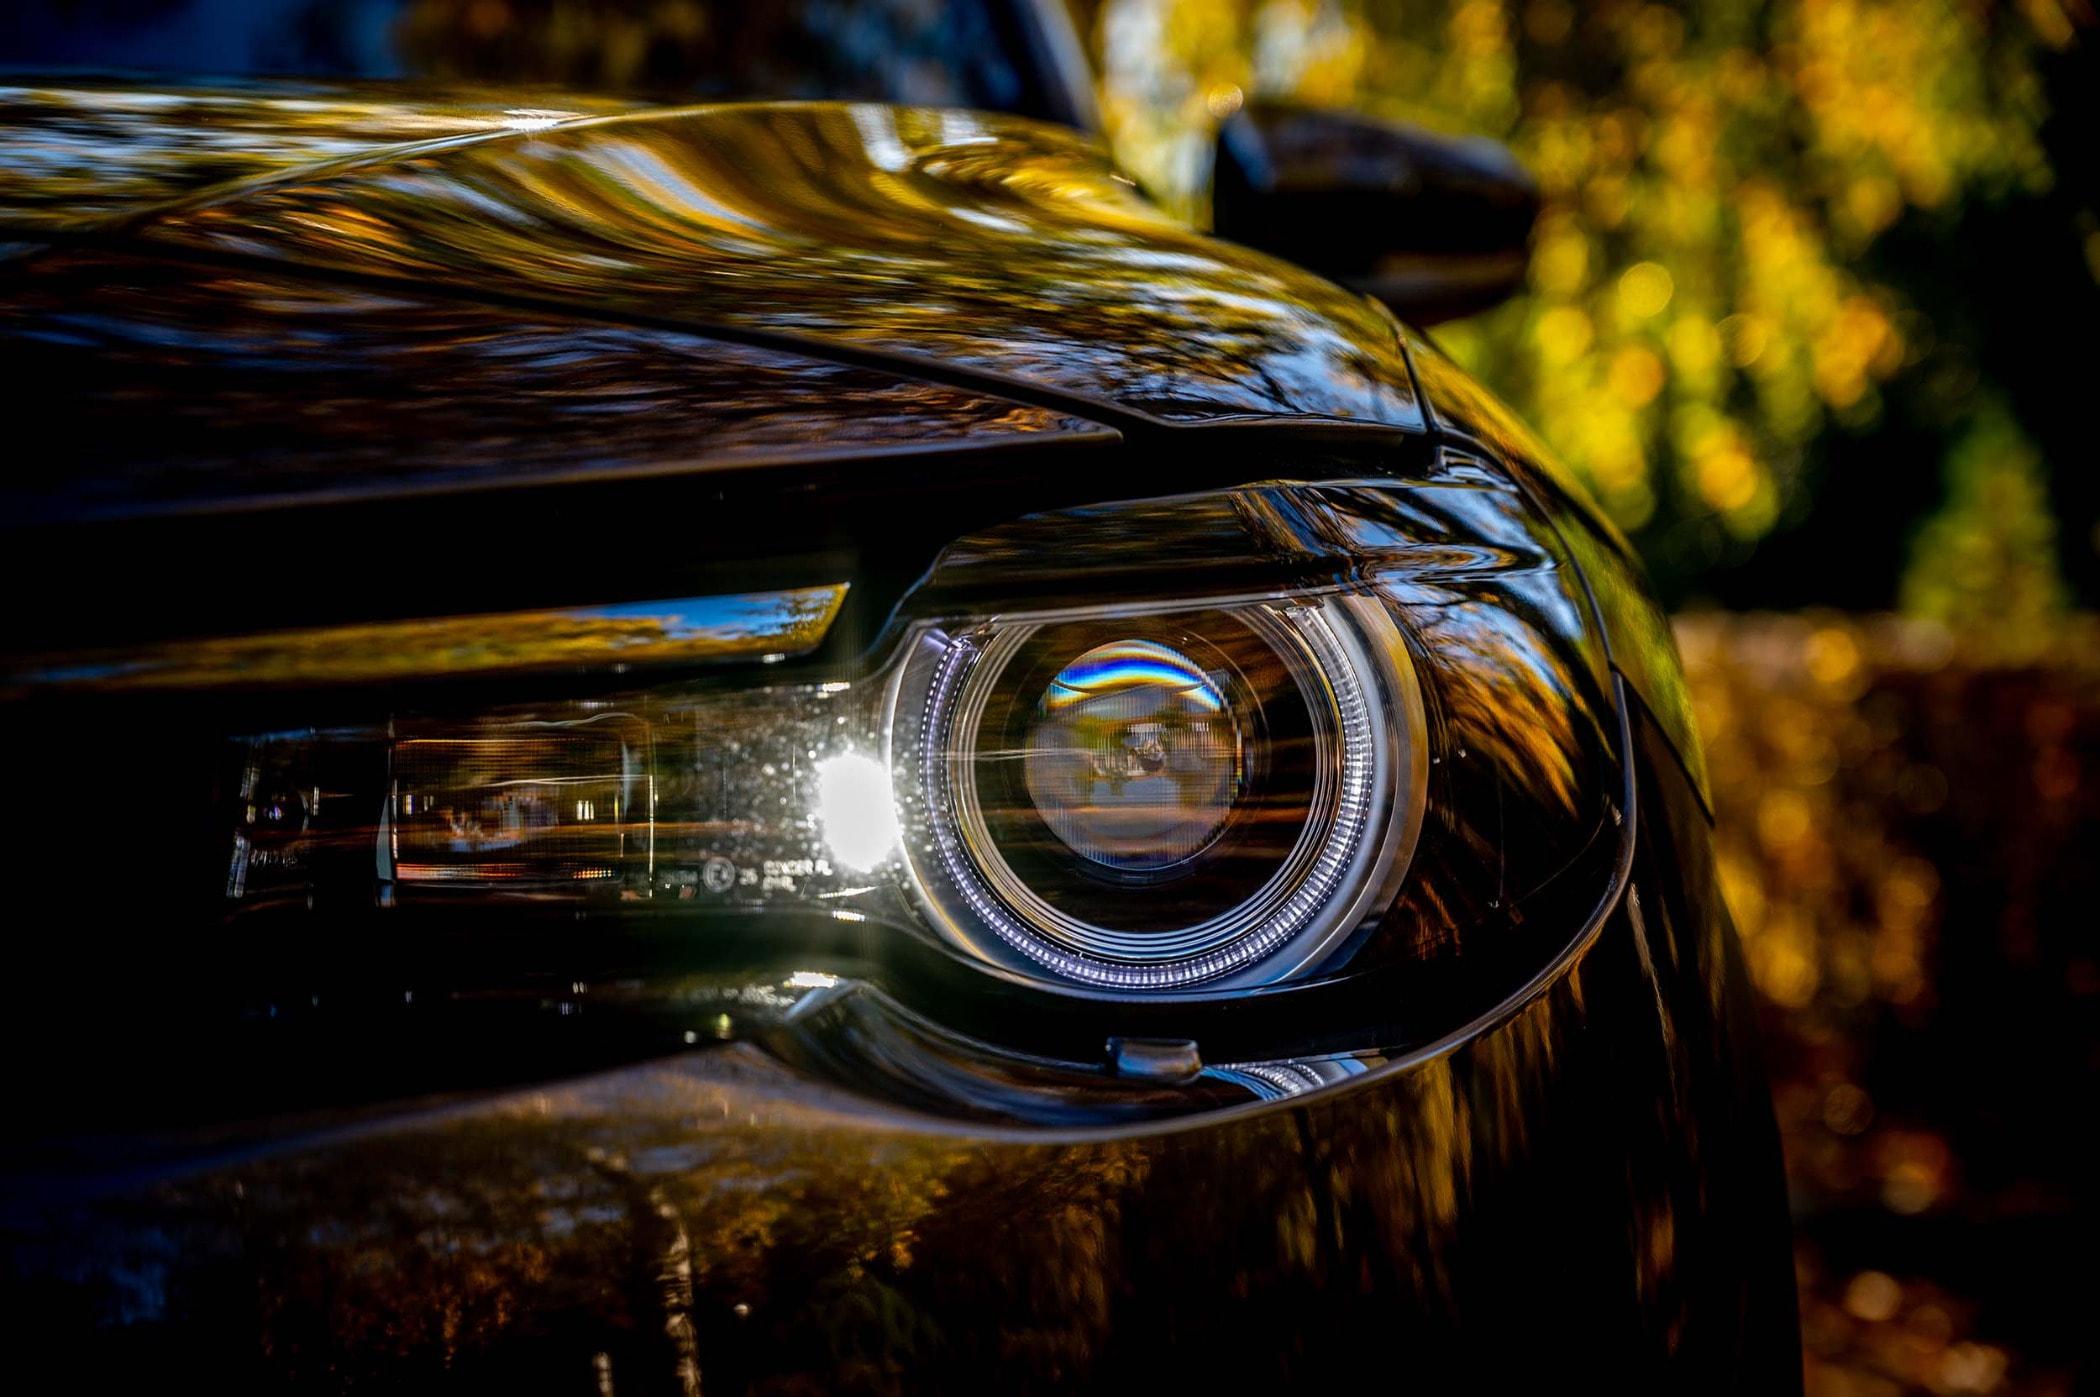 Personal luxury car, Auto part, Automotive design, Land vehicle, Light, Headlamp